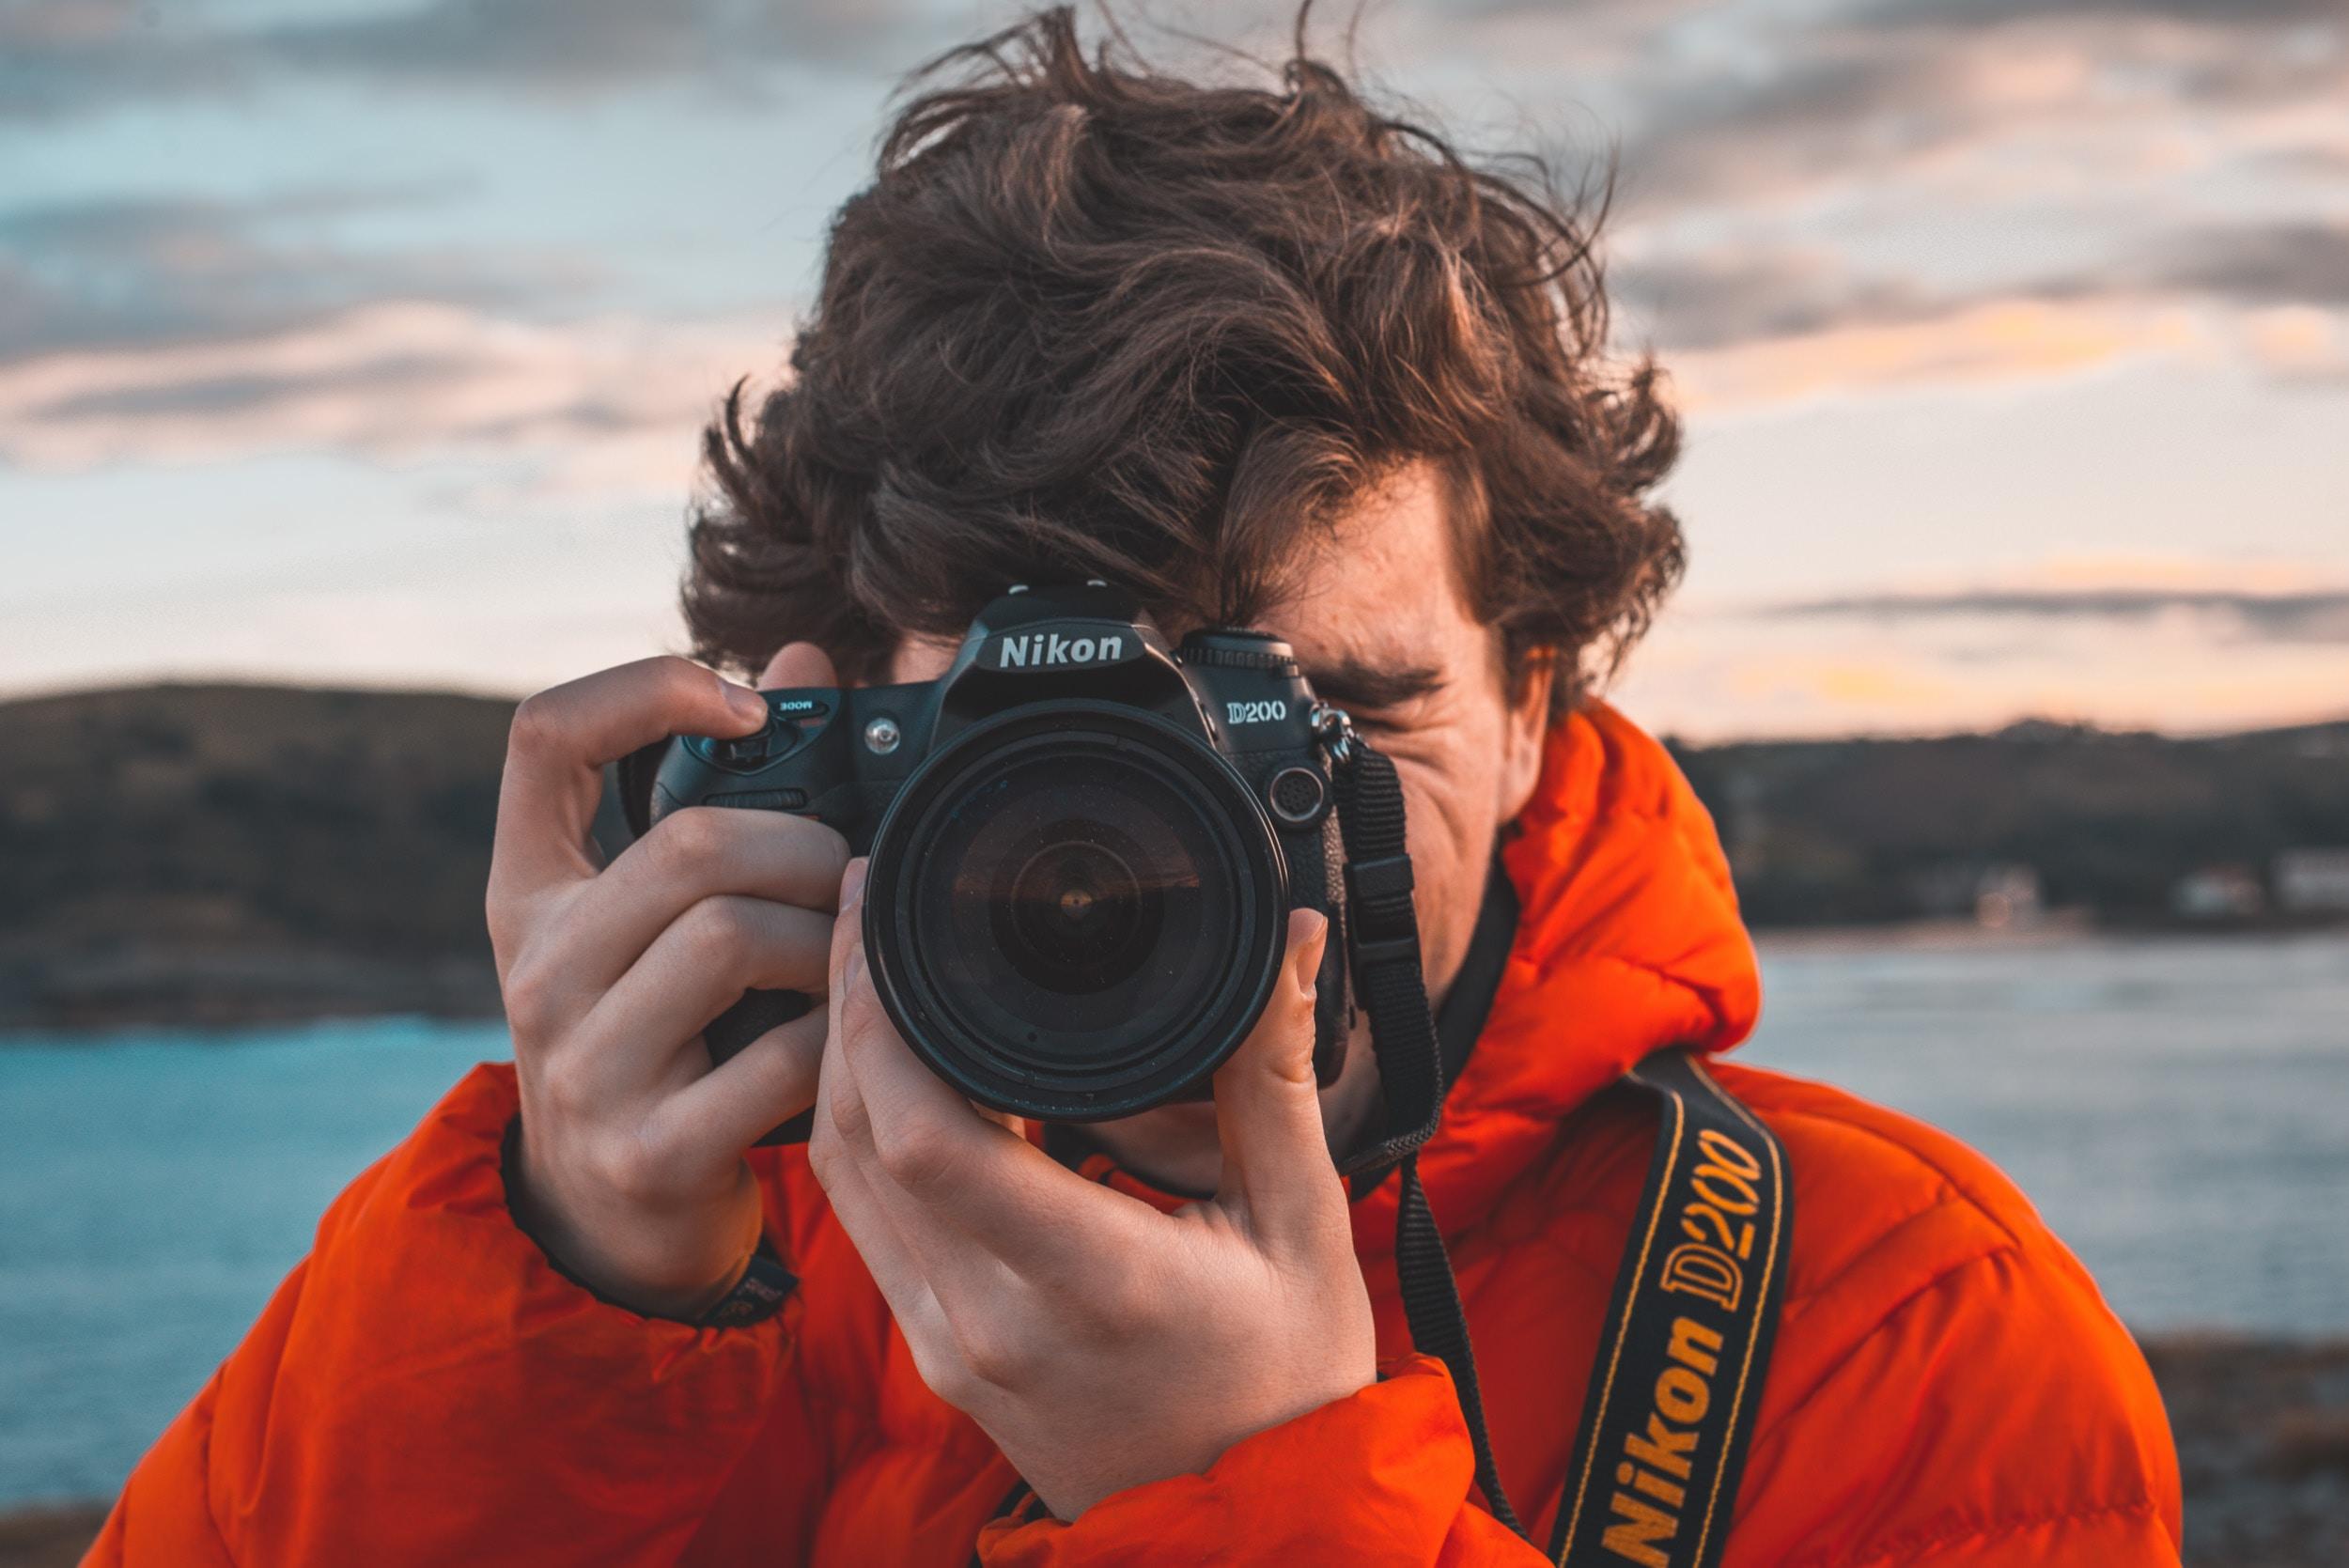 man taking a picture using black Nikon camera